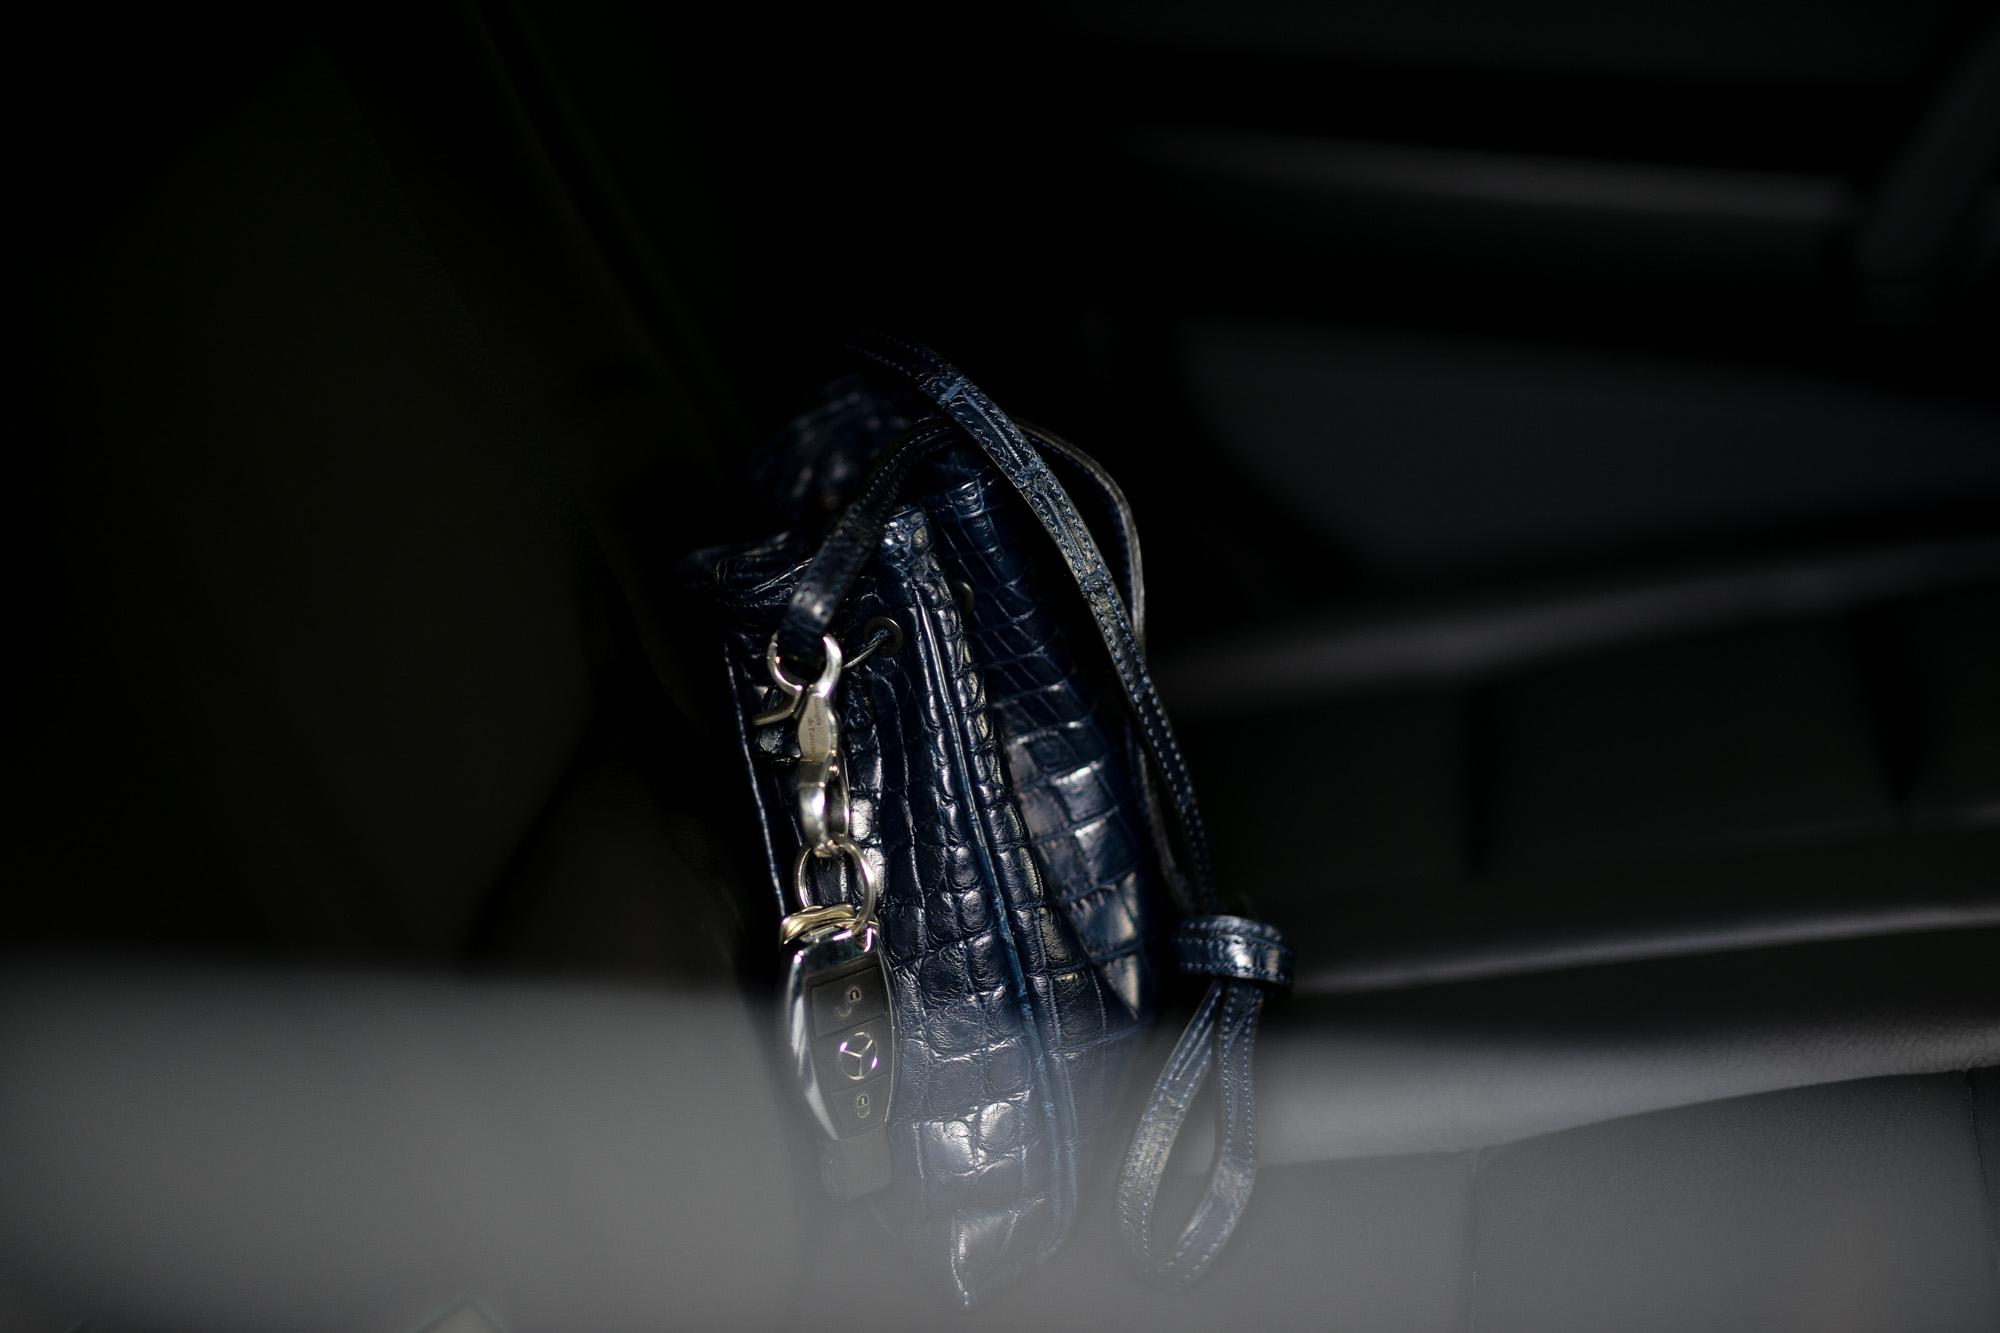 cuervo bopoha(クエルボ ヴァローナ) FLOYD(フロイド) Crocodile Leather(クロコダイルレザー) レザードローストリングバック 巾着 NAVY (ネイビー) Made in Japan(日本製) 2020【Special Model】愛知 名古屋 altoediritto アルトエデリット